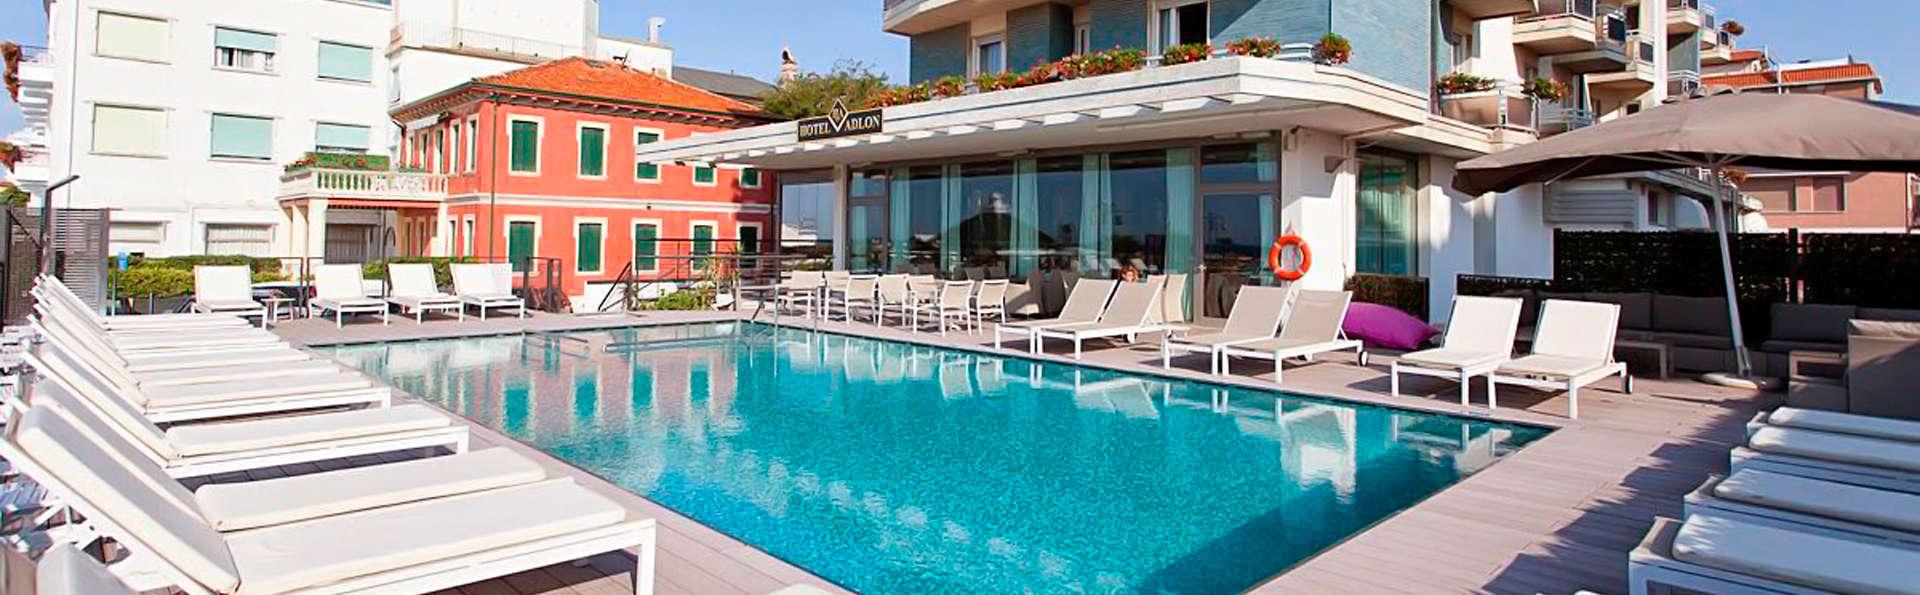 Hotel Adlon - edit_front_pool.jpg